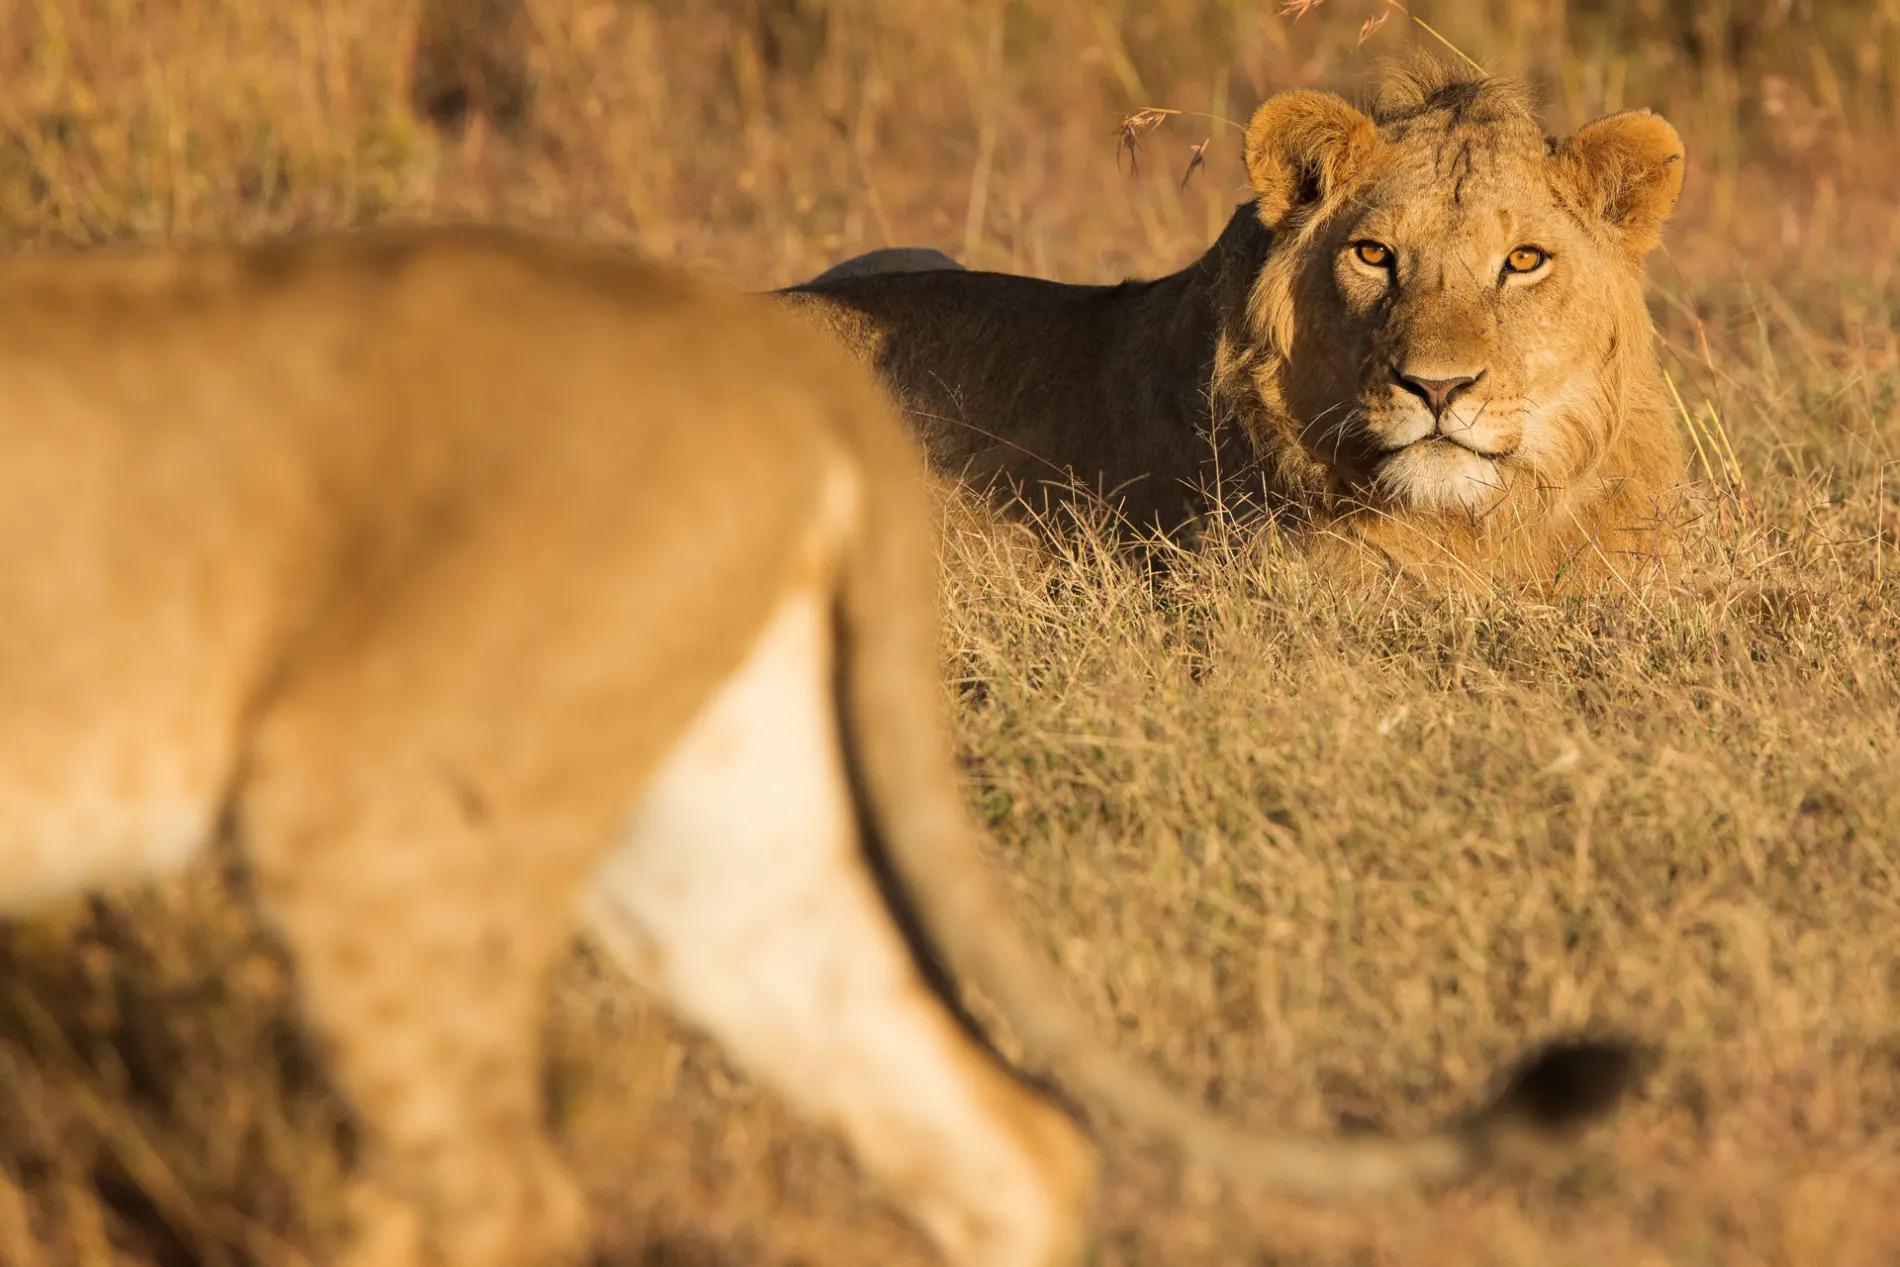 Pejeta Lions 2